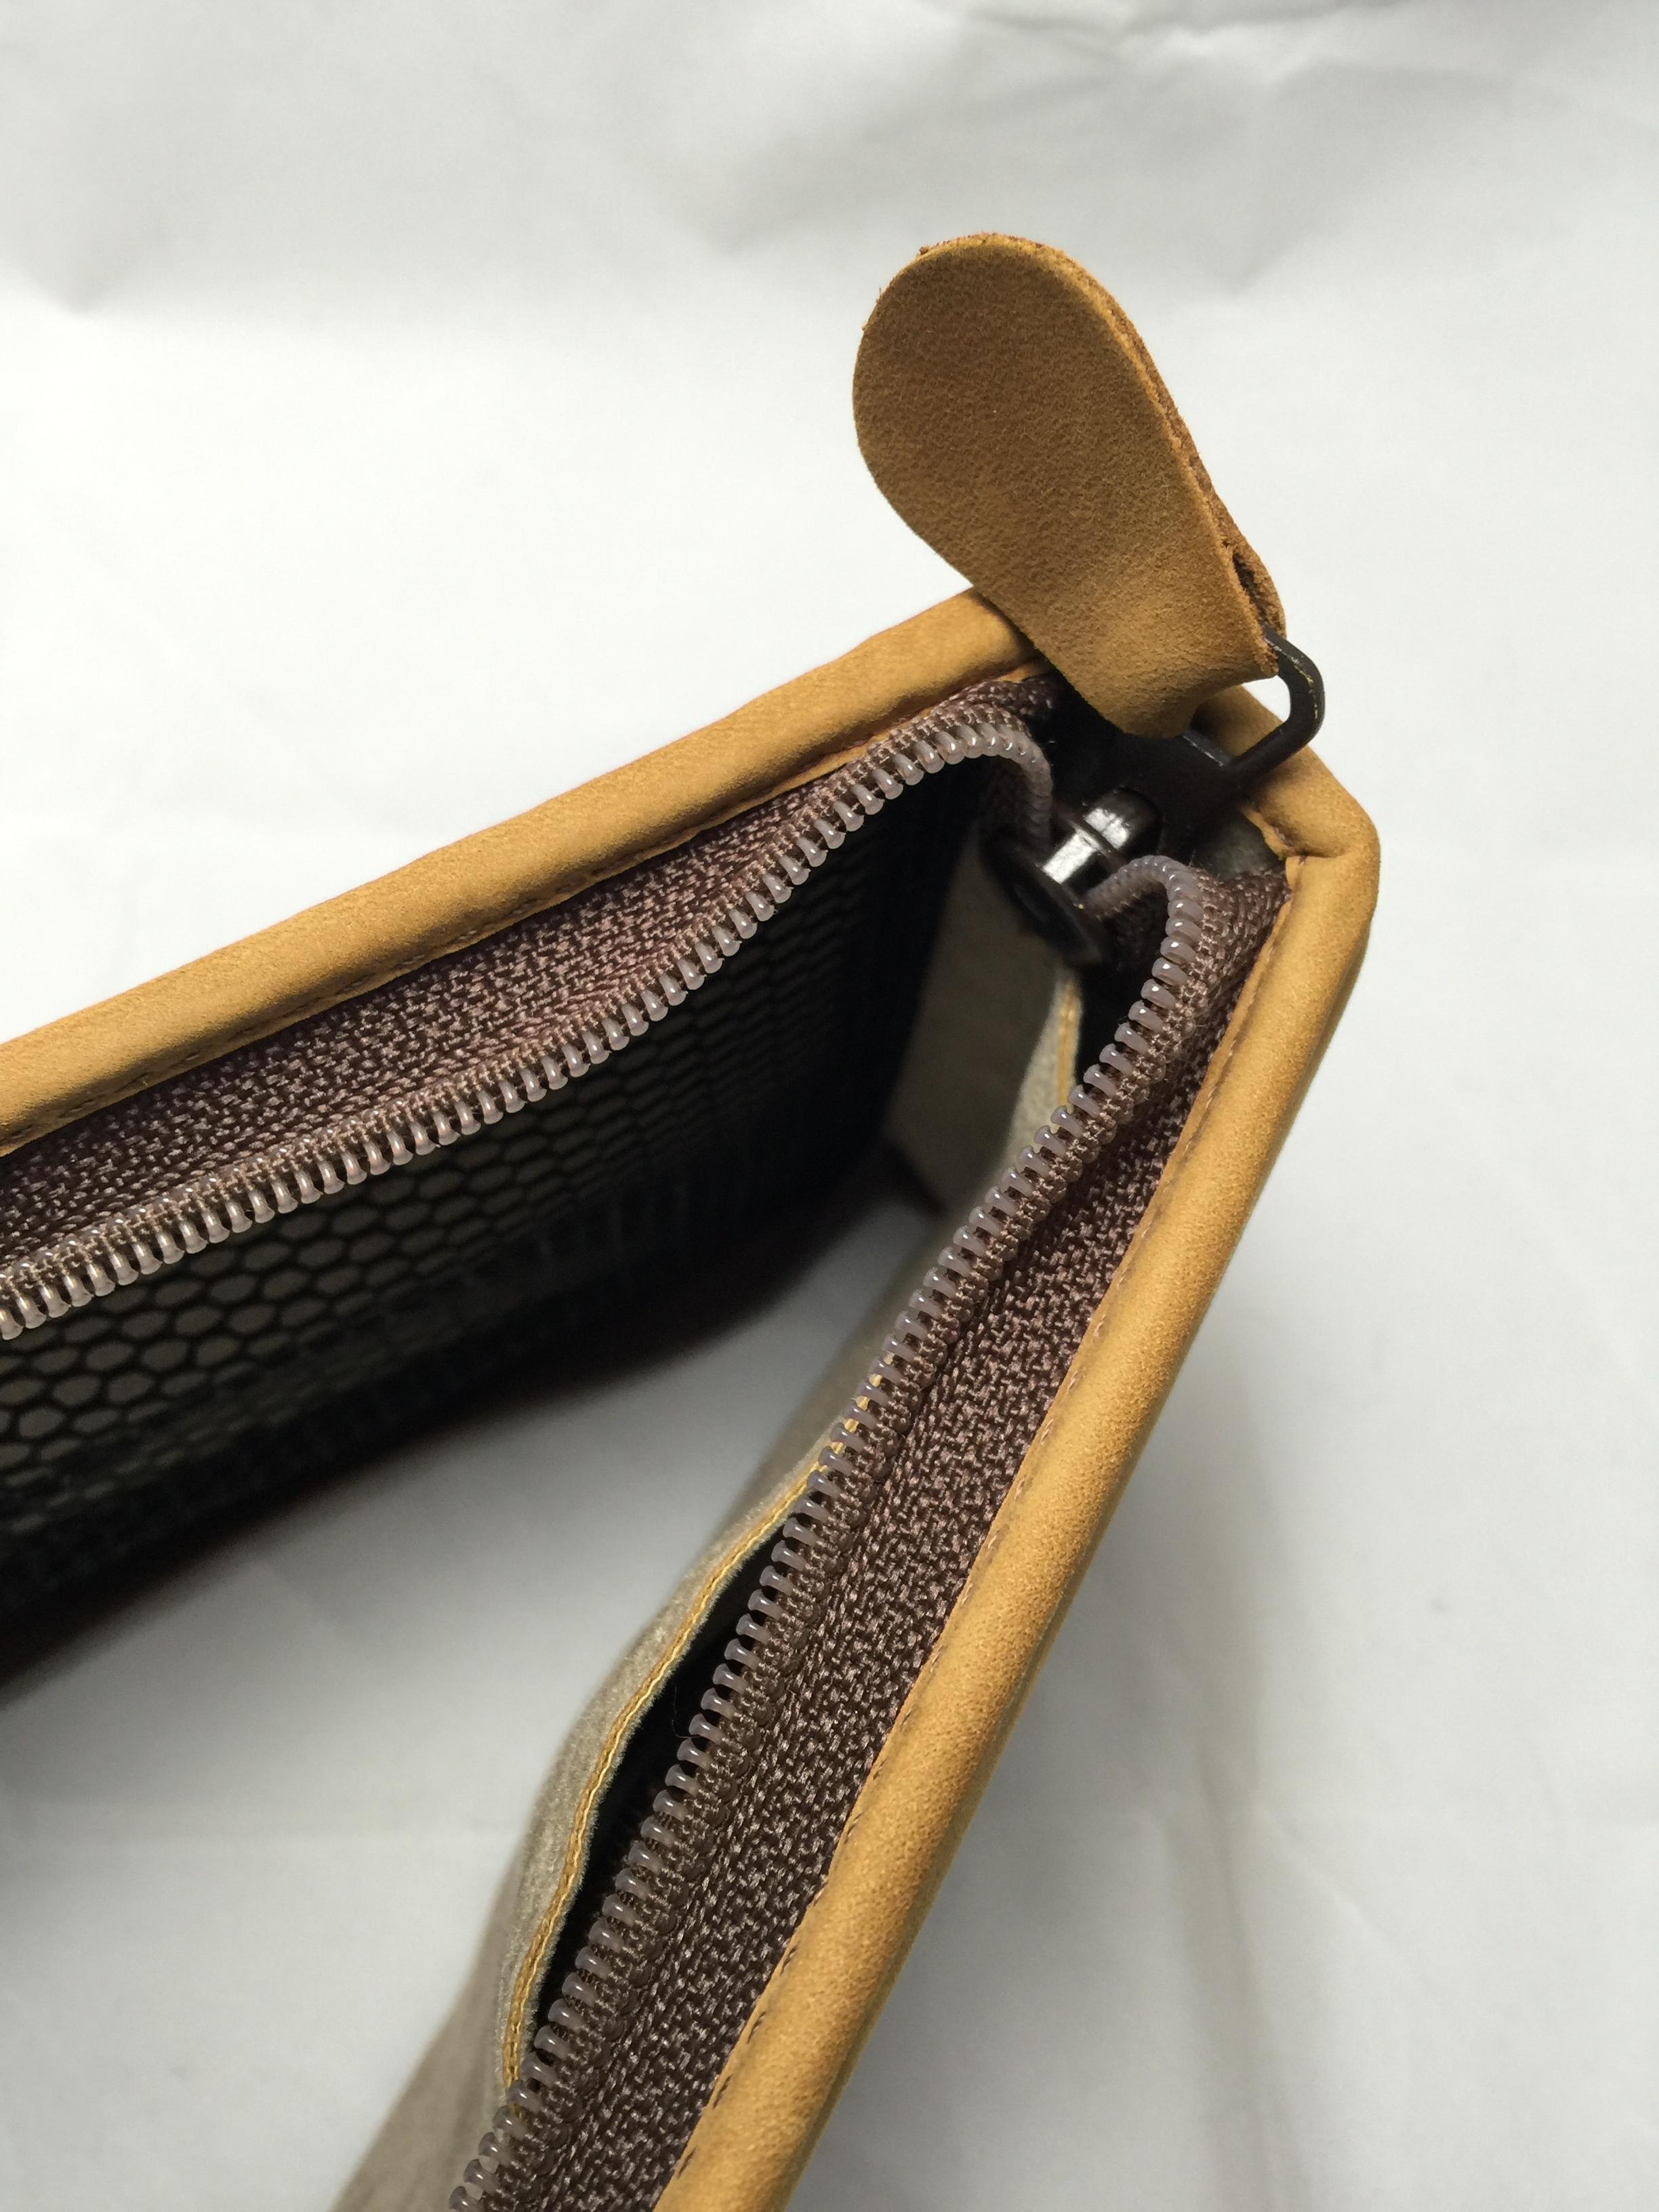 kaweco-leather-case-zipper